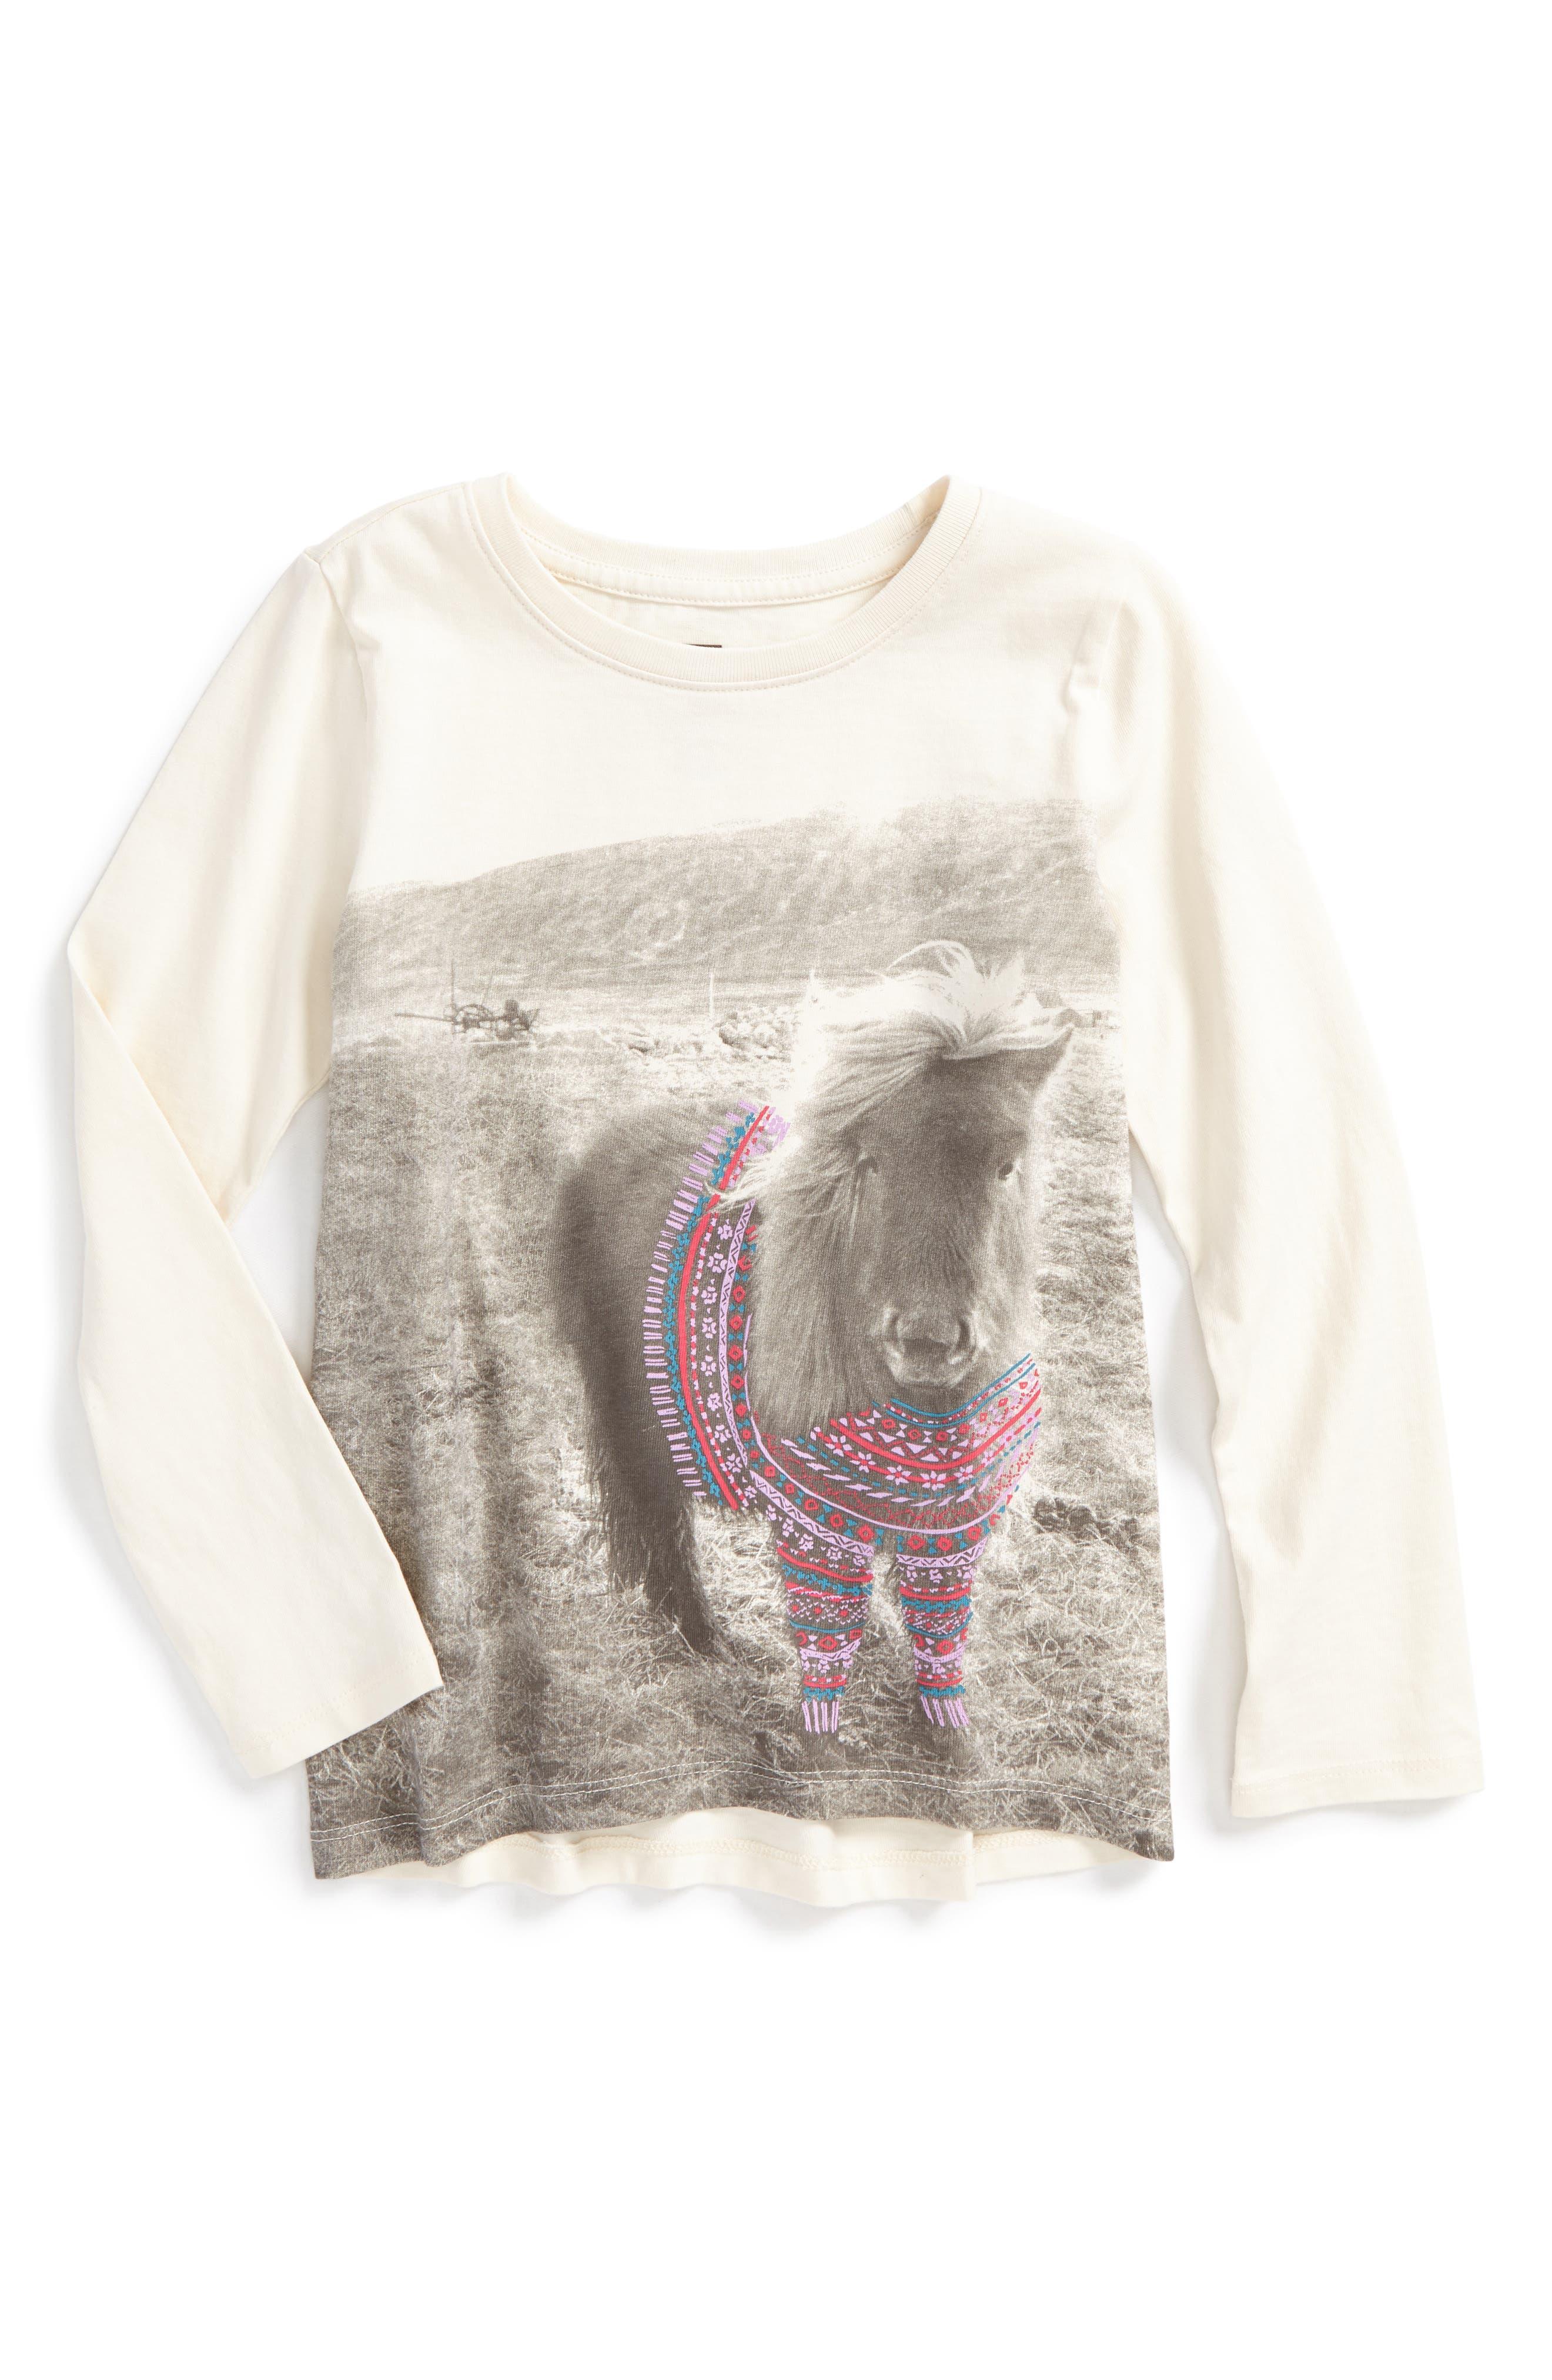 Main Image - Tea Collection Shetland Sweater Tee (Toddler Girls, Little Girls & Big Girls)